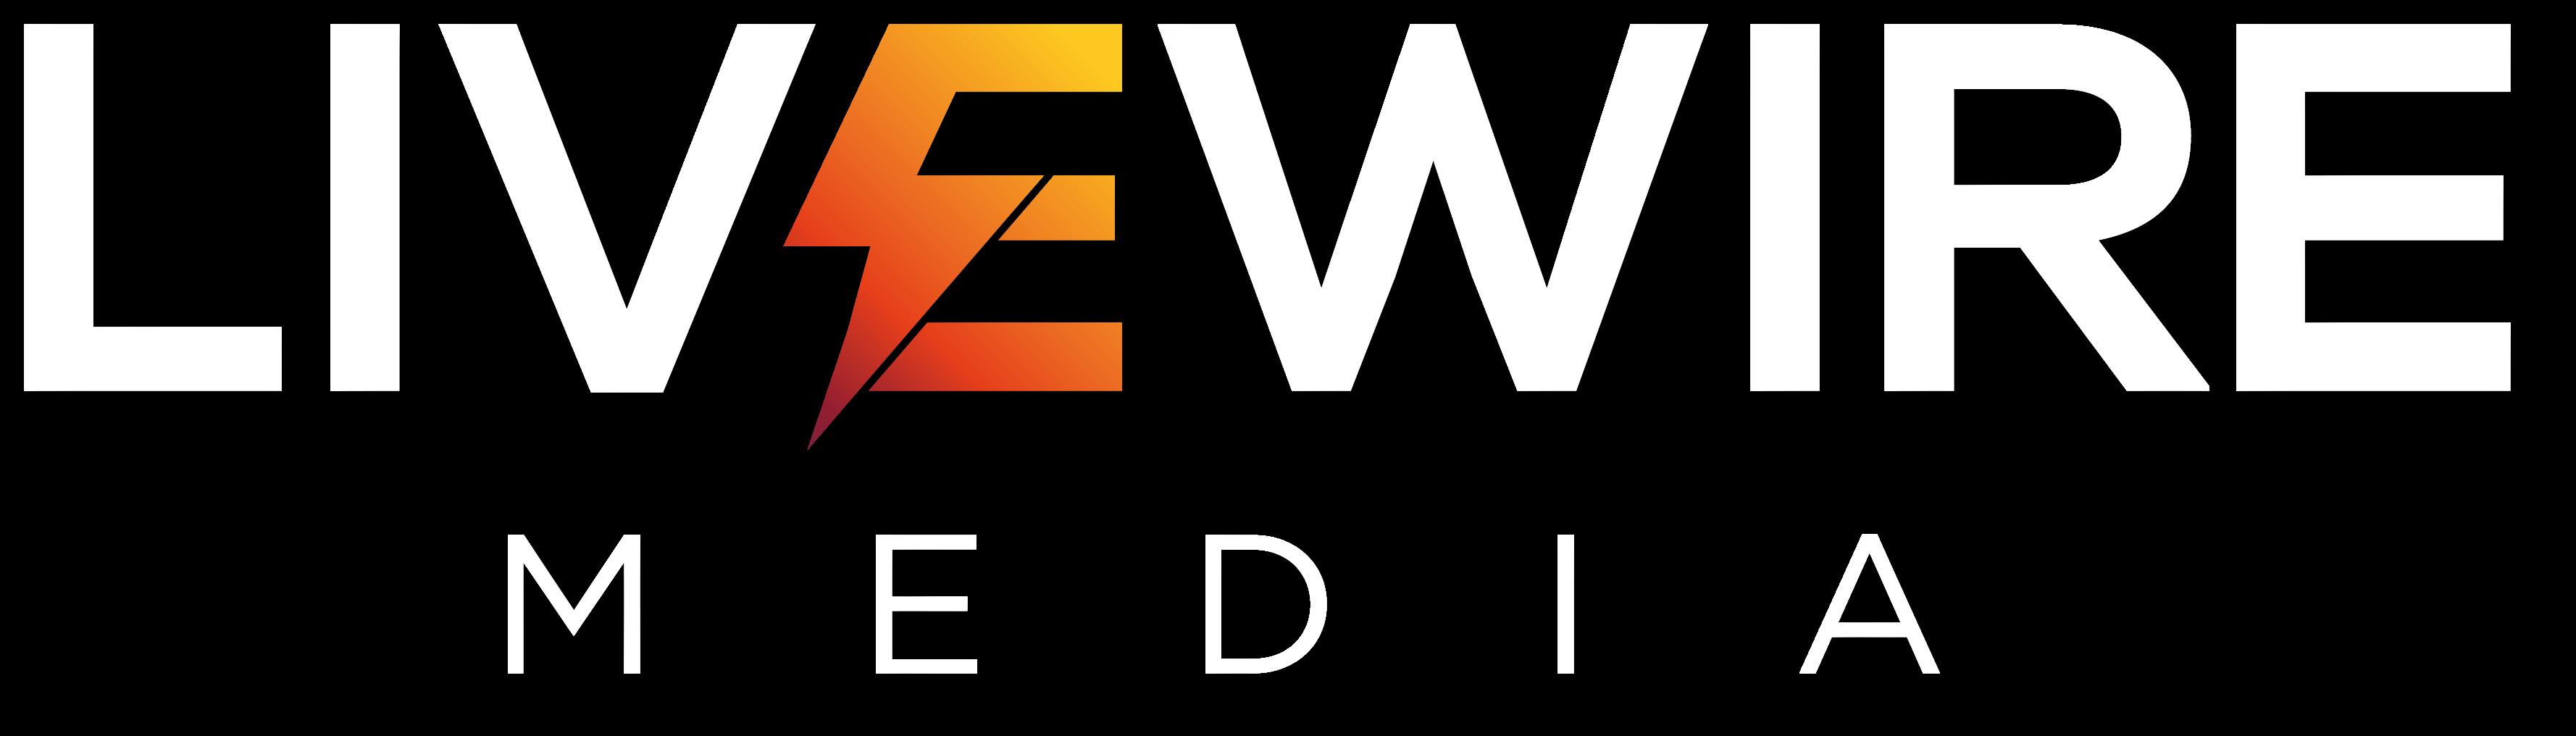 livewire media logo white